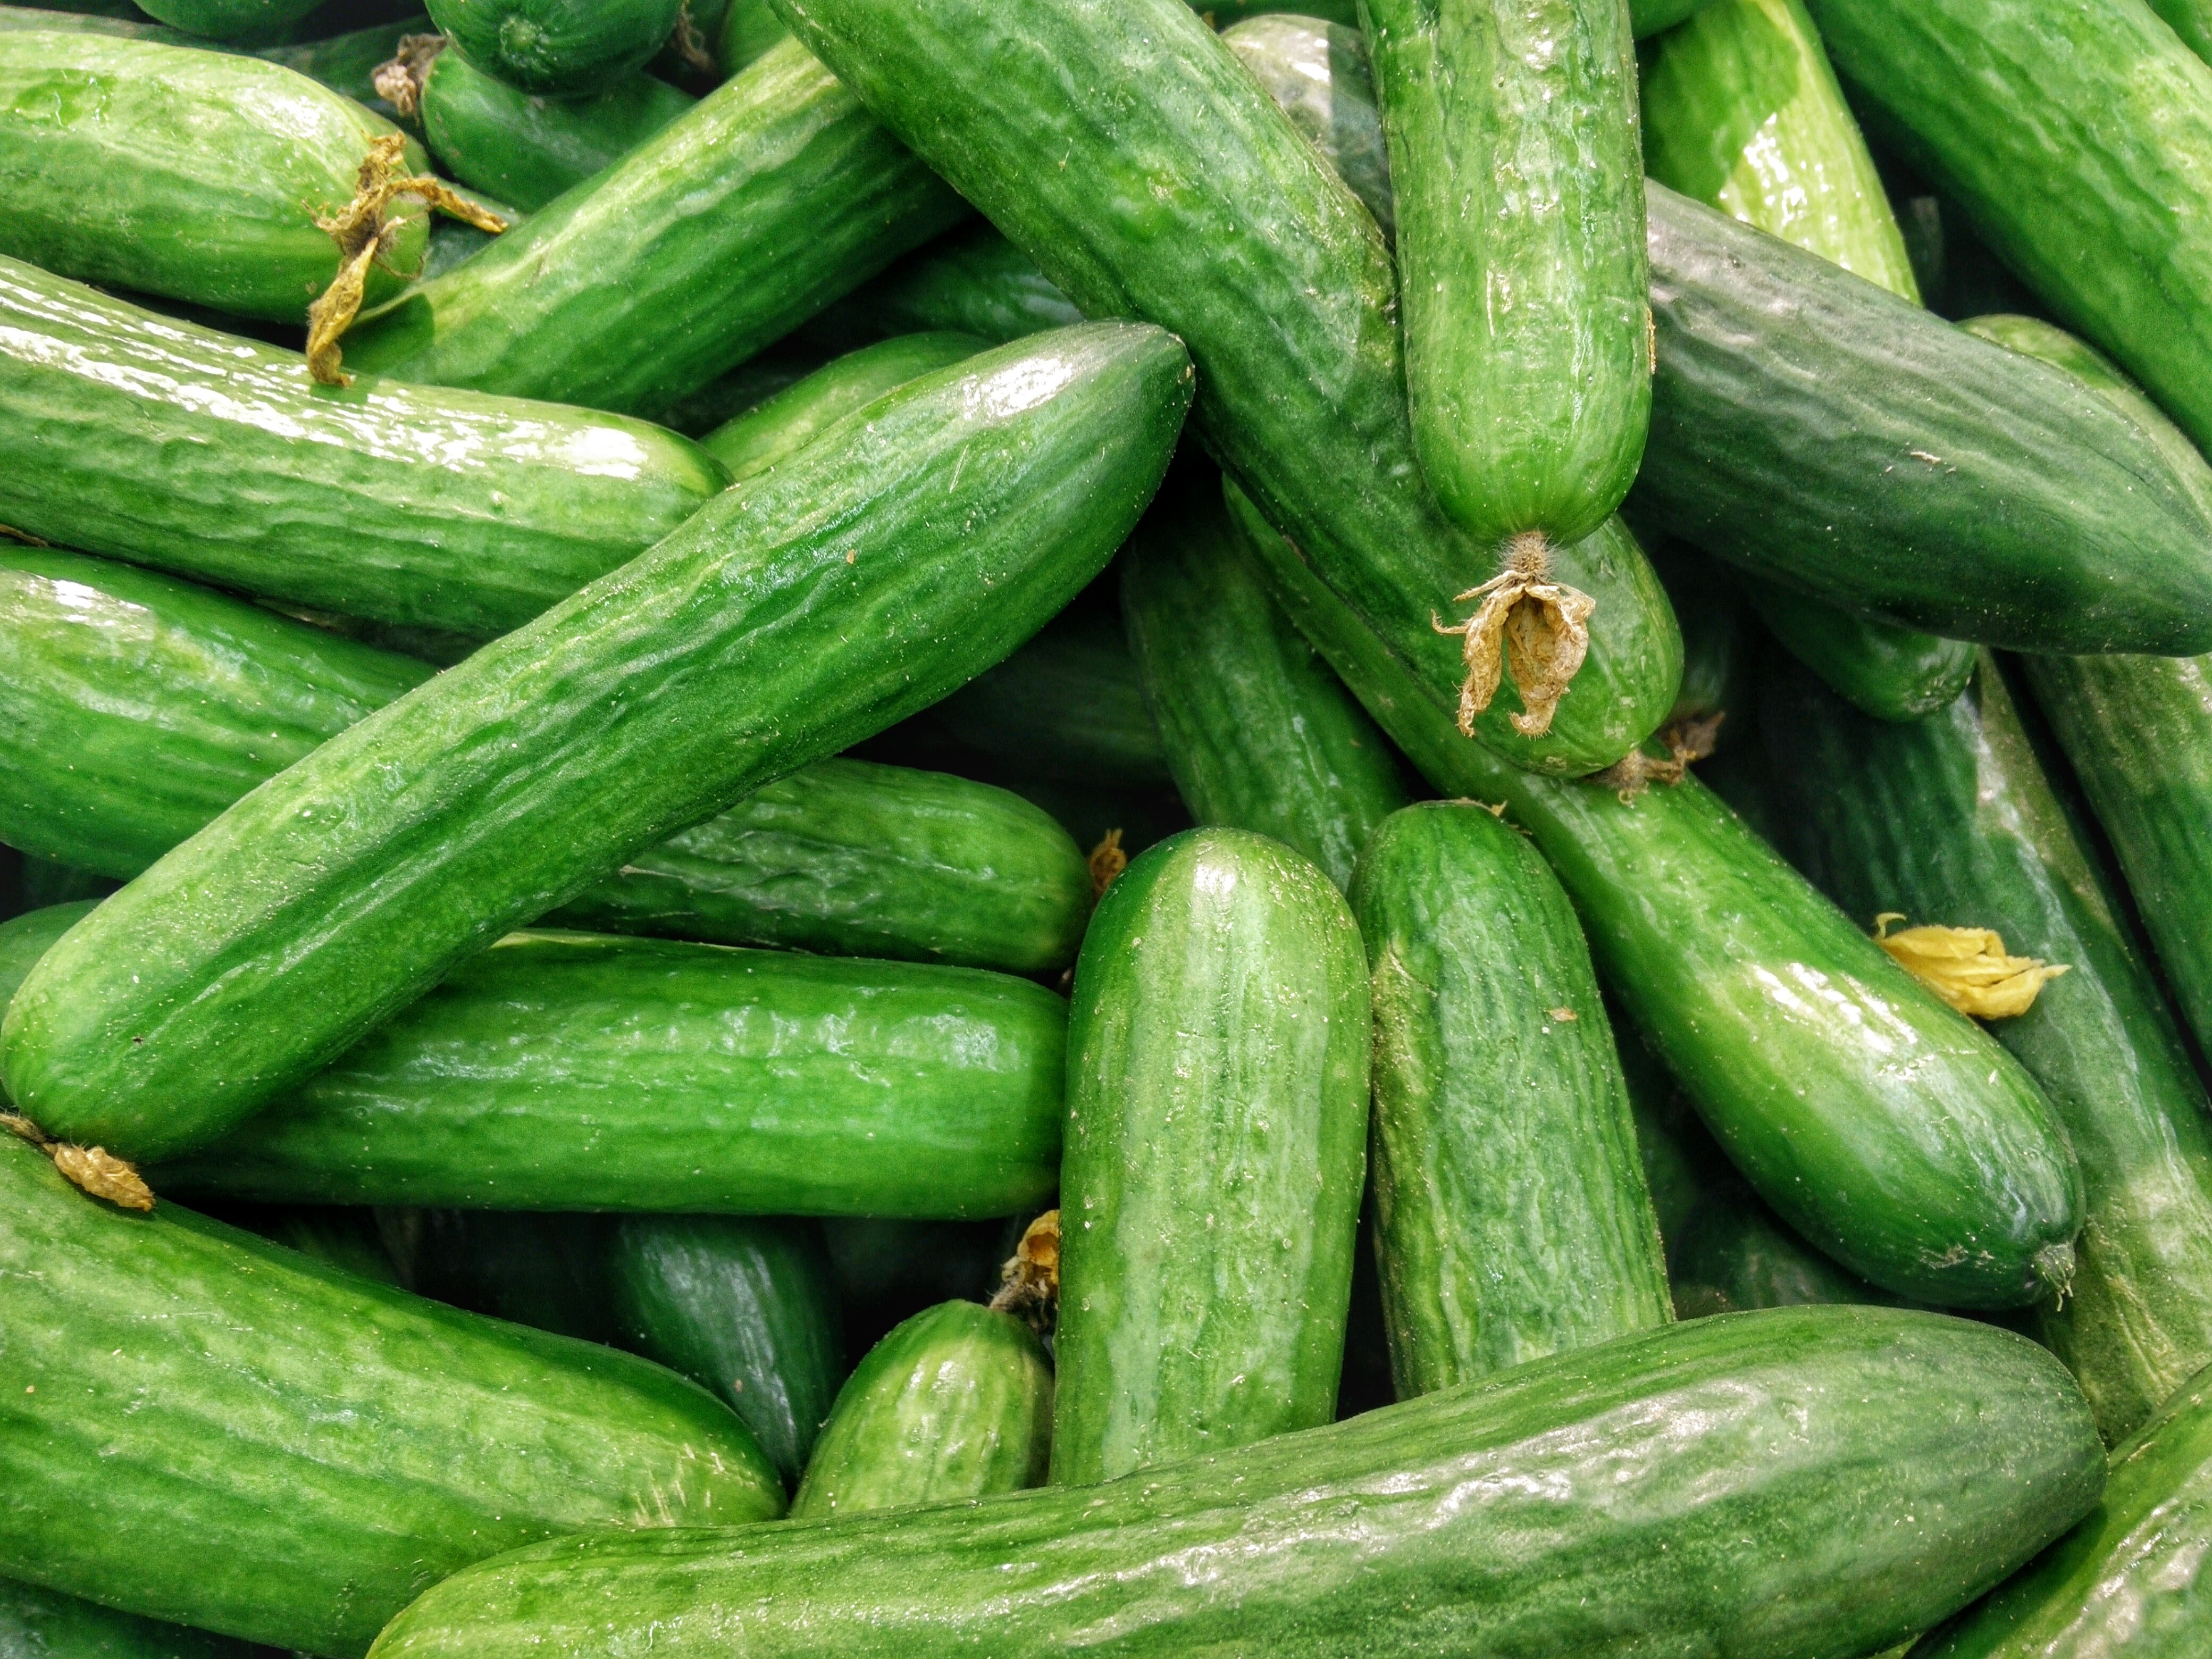 Outdoor Farmers' Market